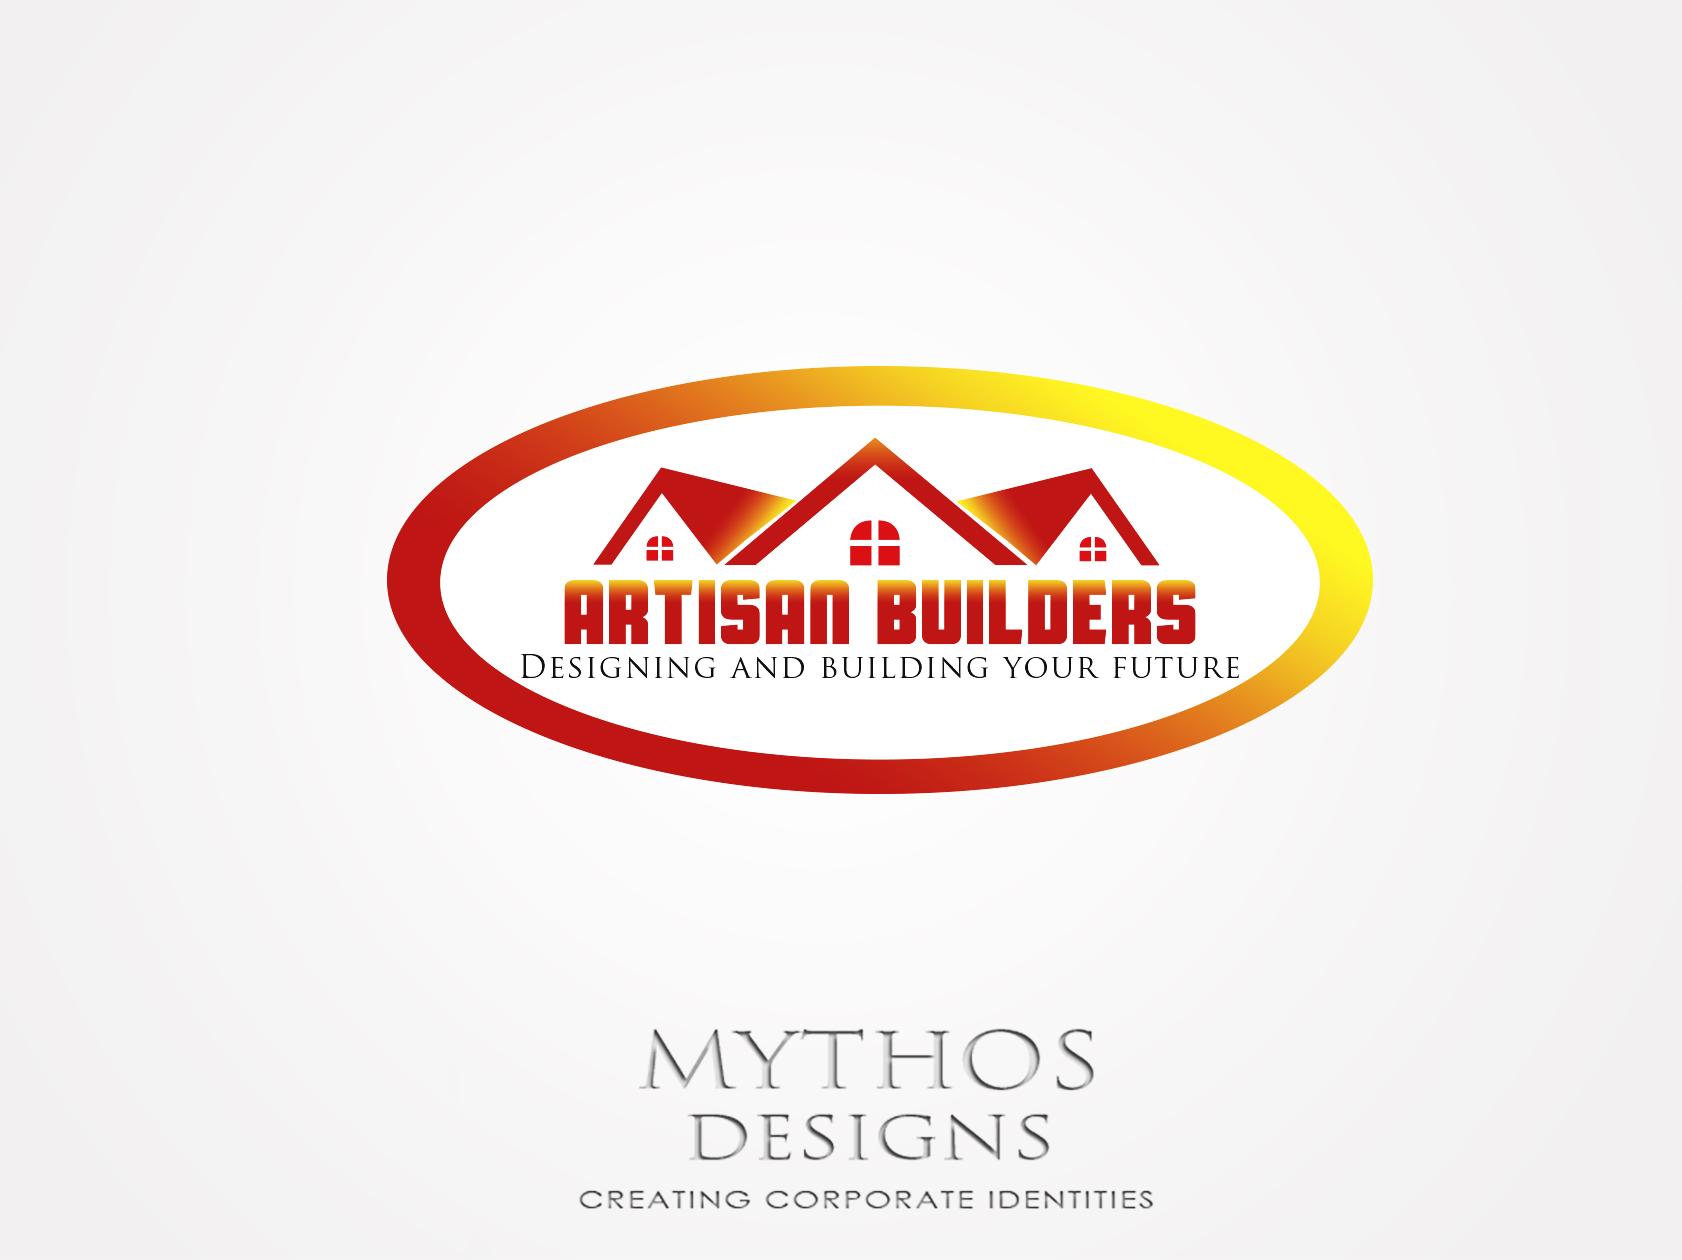 Logo Design by Mythos Designs - Entry No. 65 in the Logo Design Contest Captivating Logo Design for Artisan Builders.